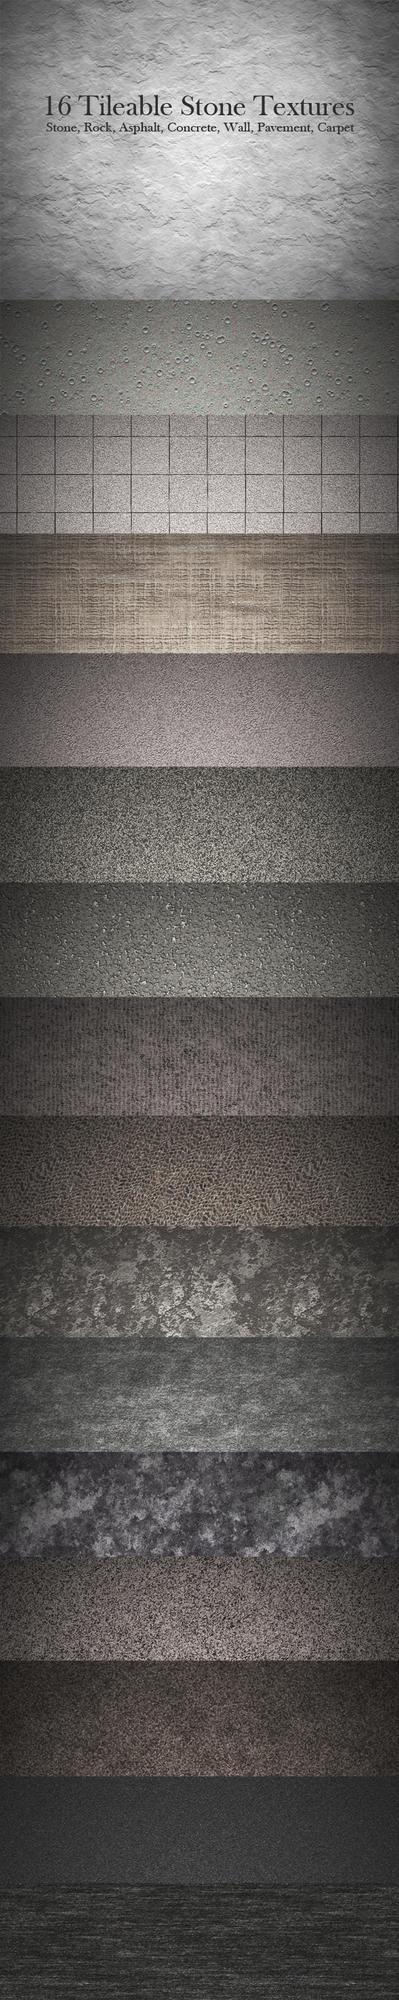 16 Tileable Stone Textures by MuzikizumWeb